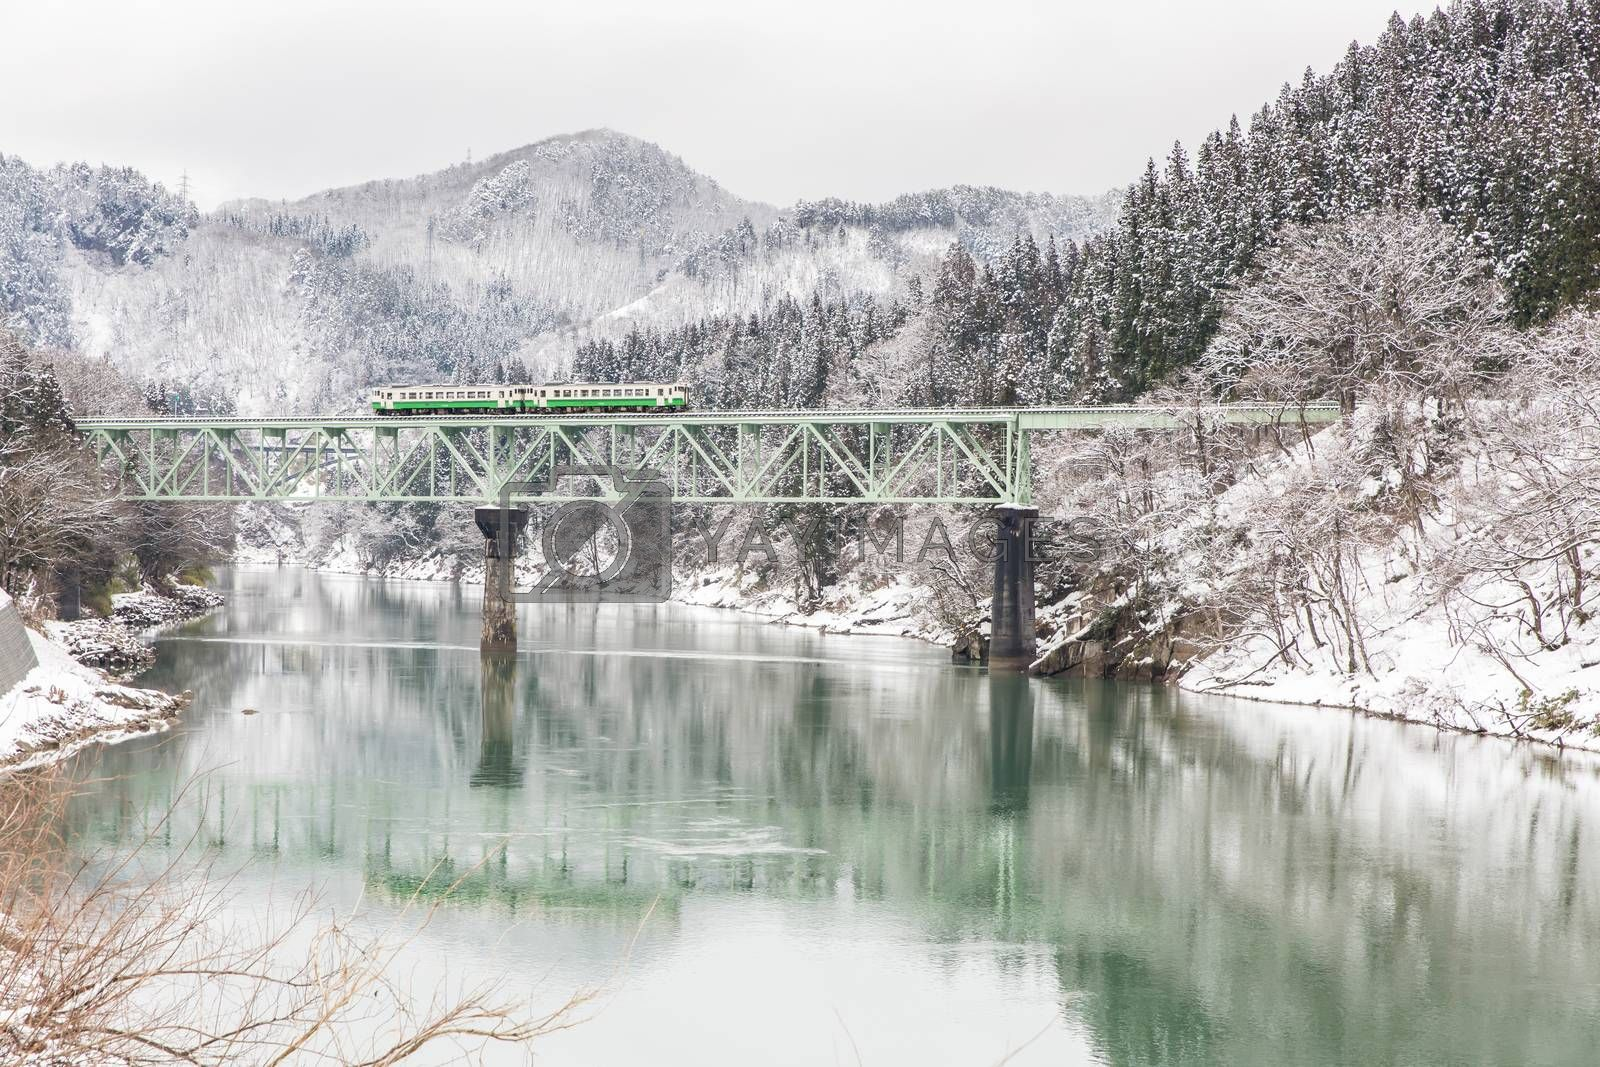 Train in Winter landscape snow on bridge